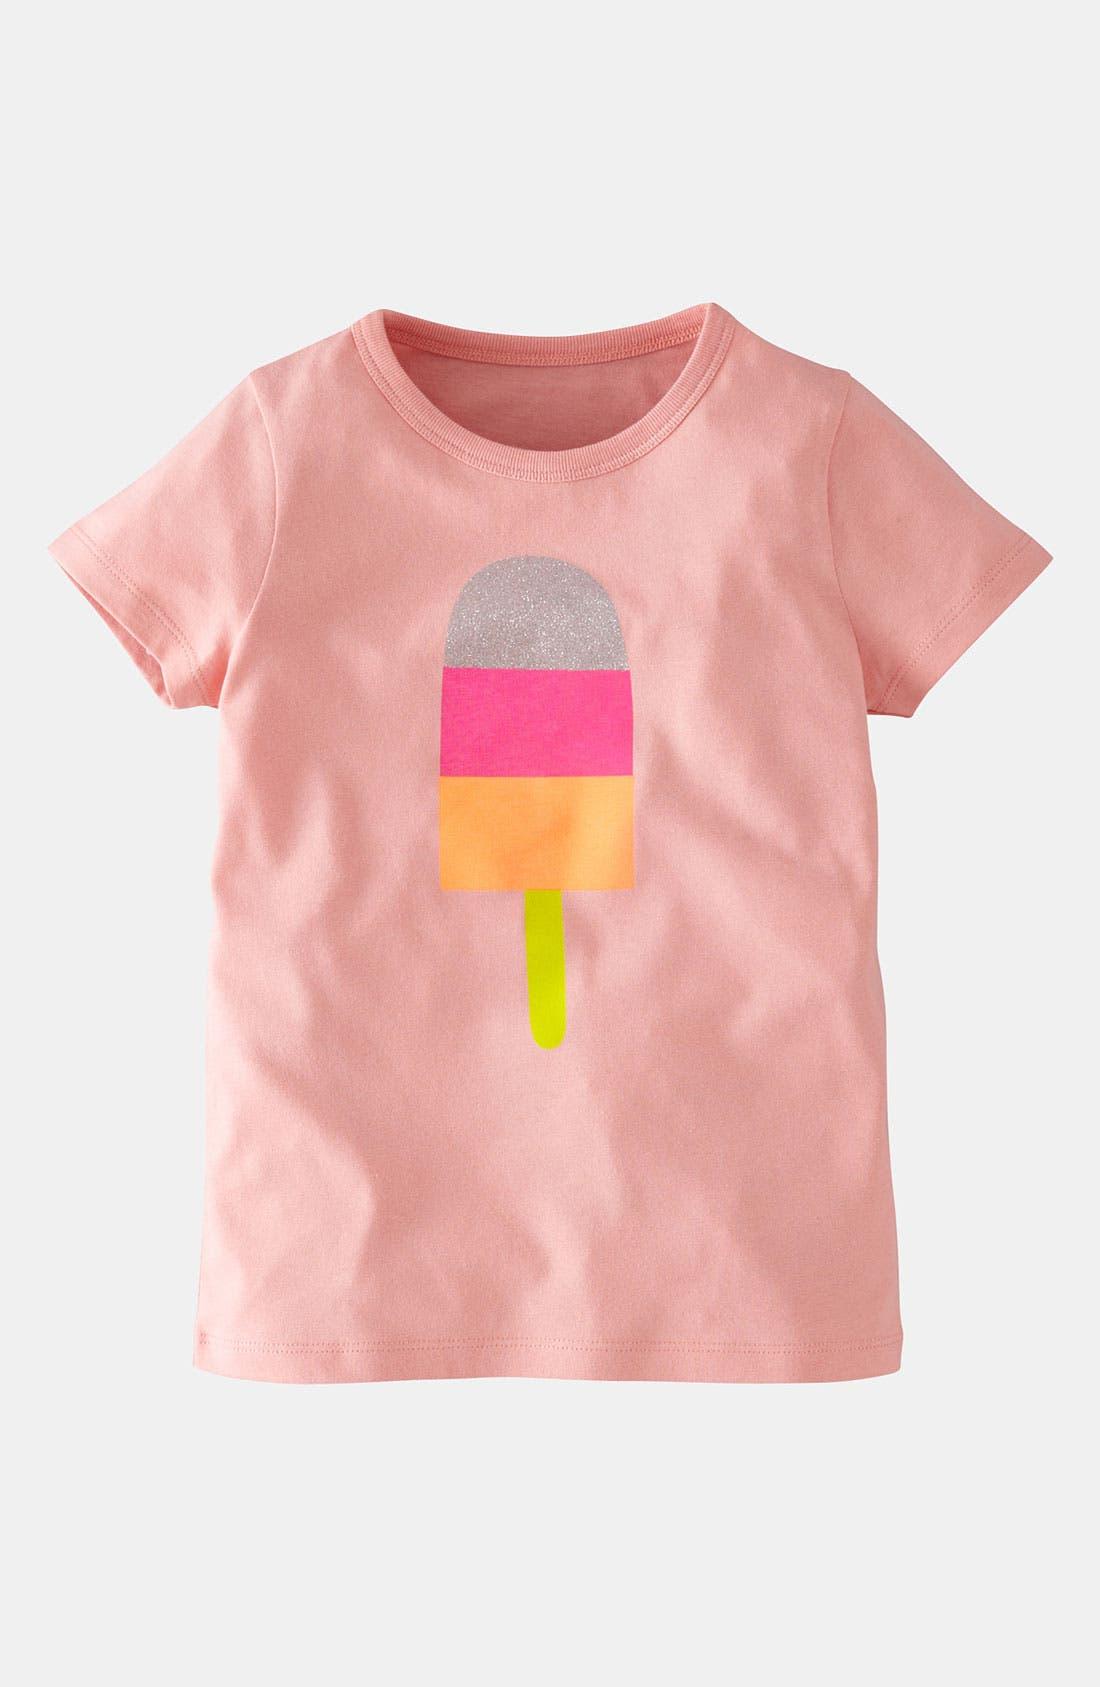 Main Image - Mini Boden 'Glittery' Graphic Tee (Little Girls & Big Girls)